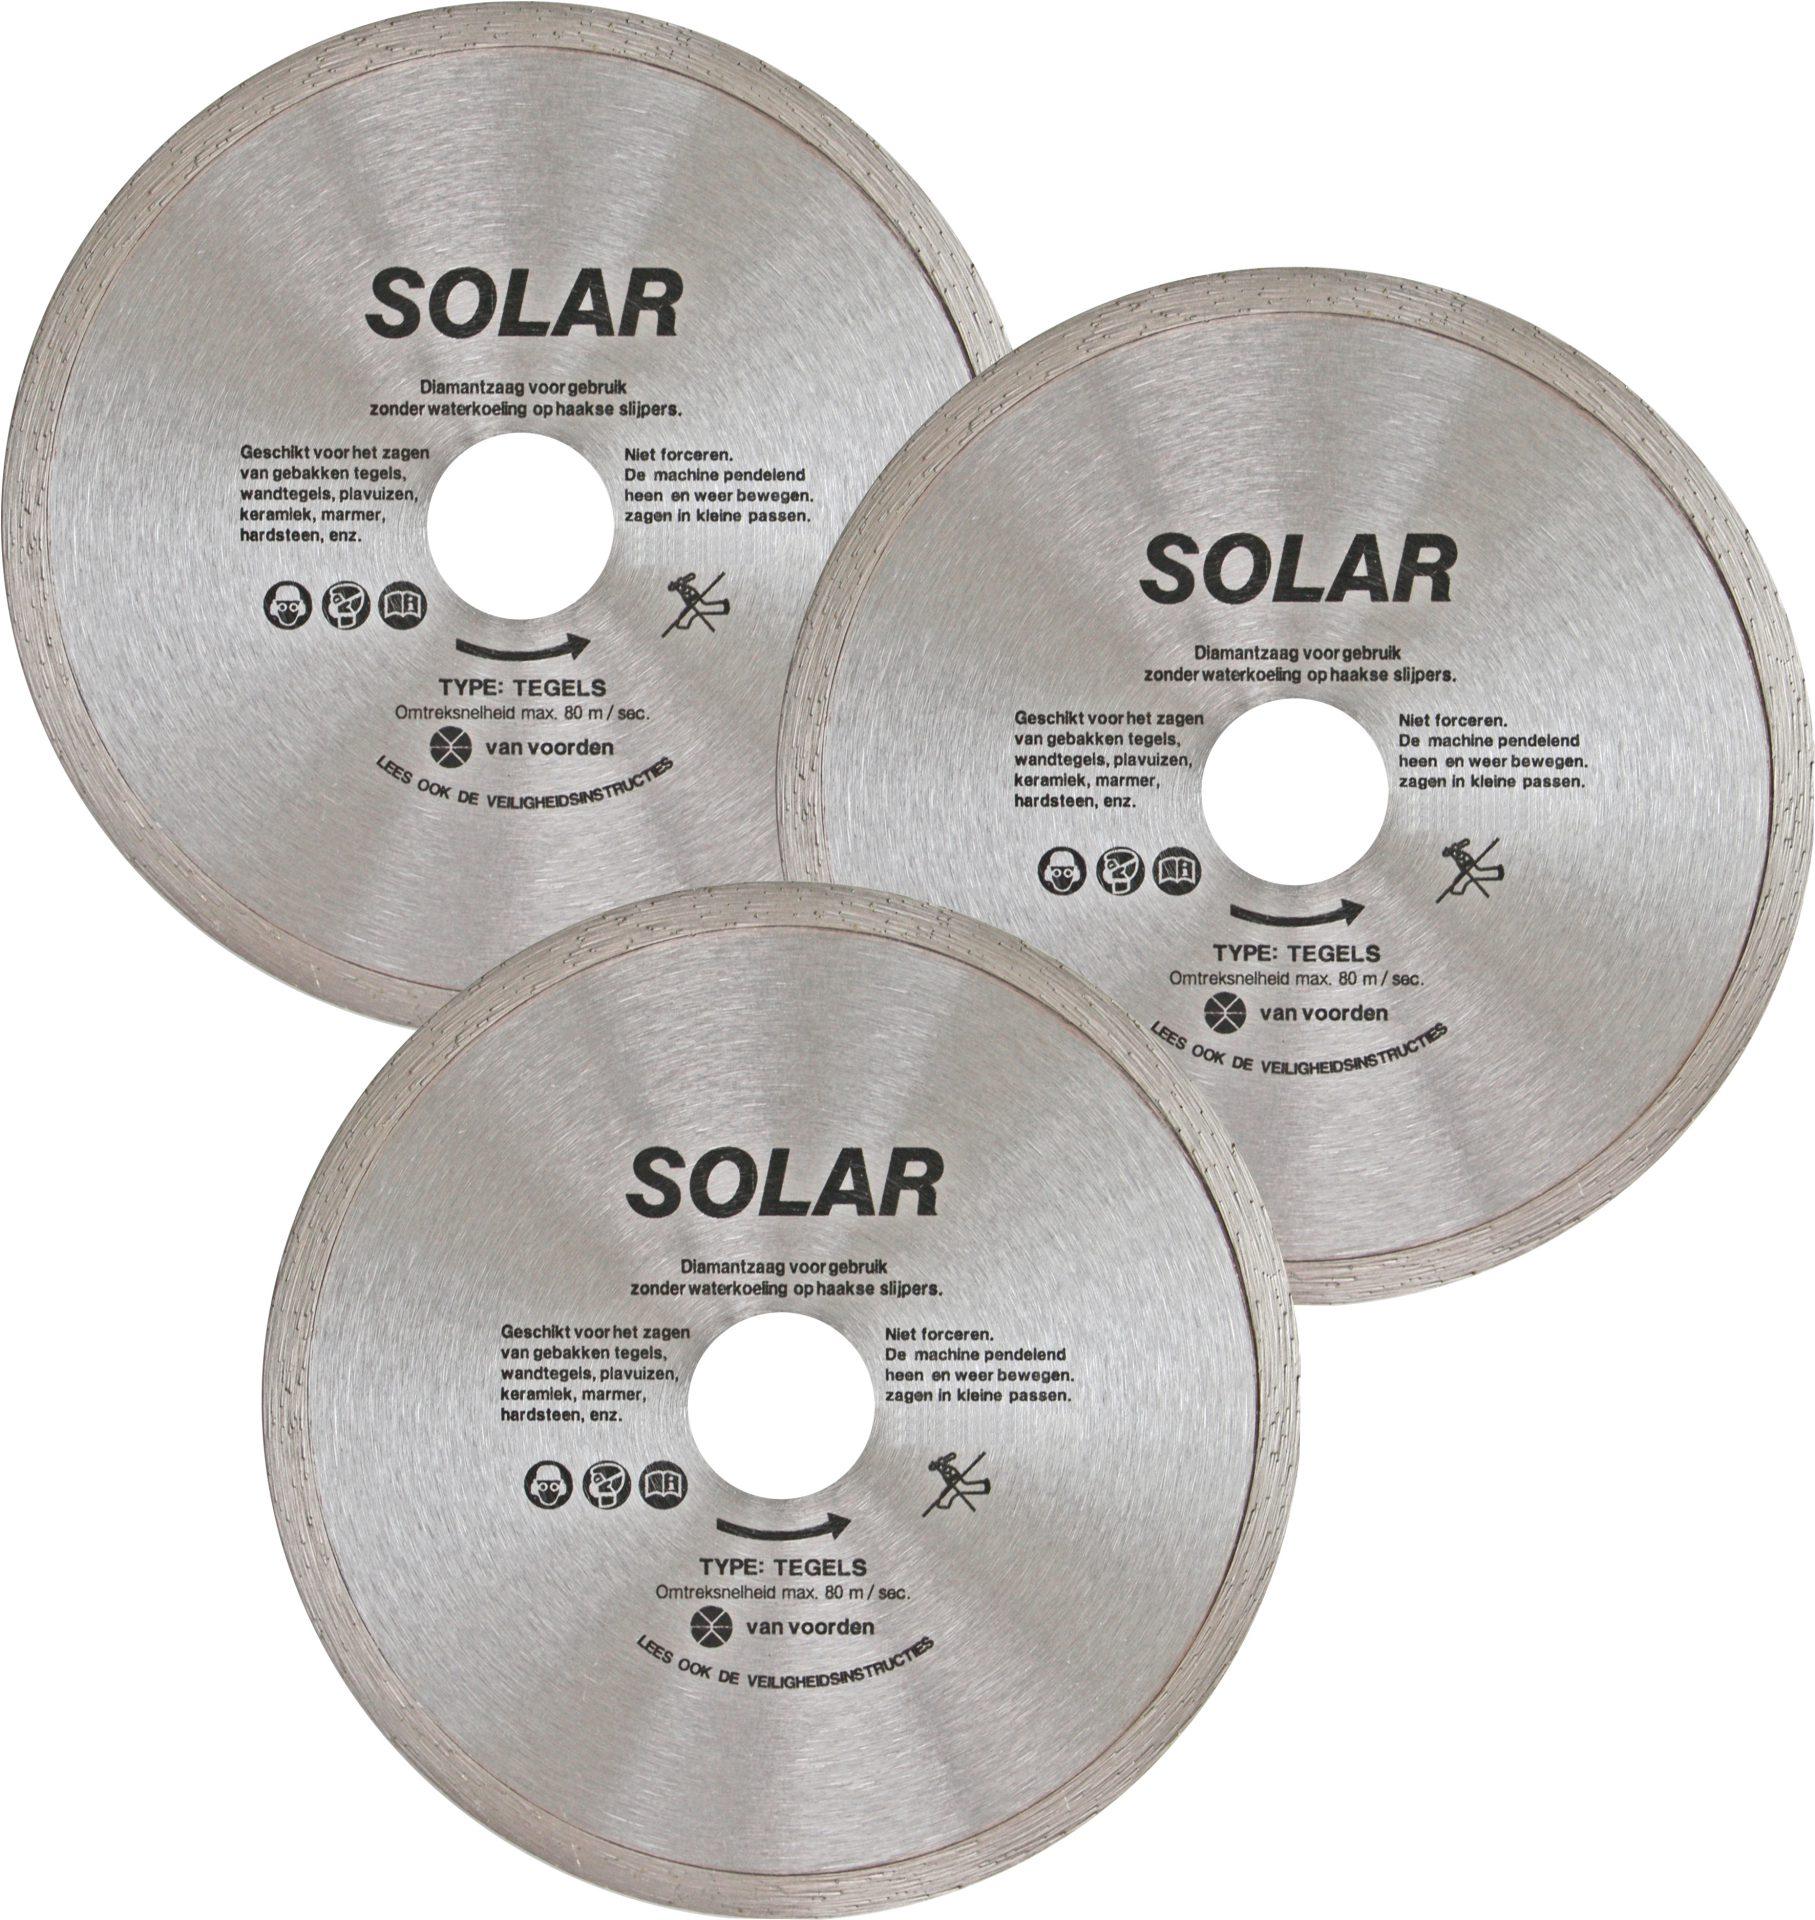 diamantzaagblad-tegelzaag-budget-vloertegel-wand-tegel-diamant-zaag-solar-voorden